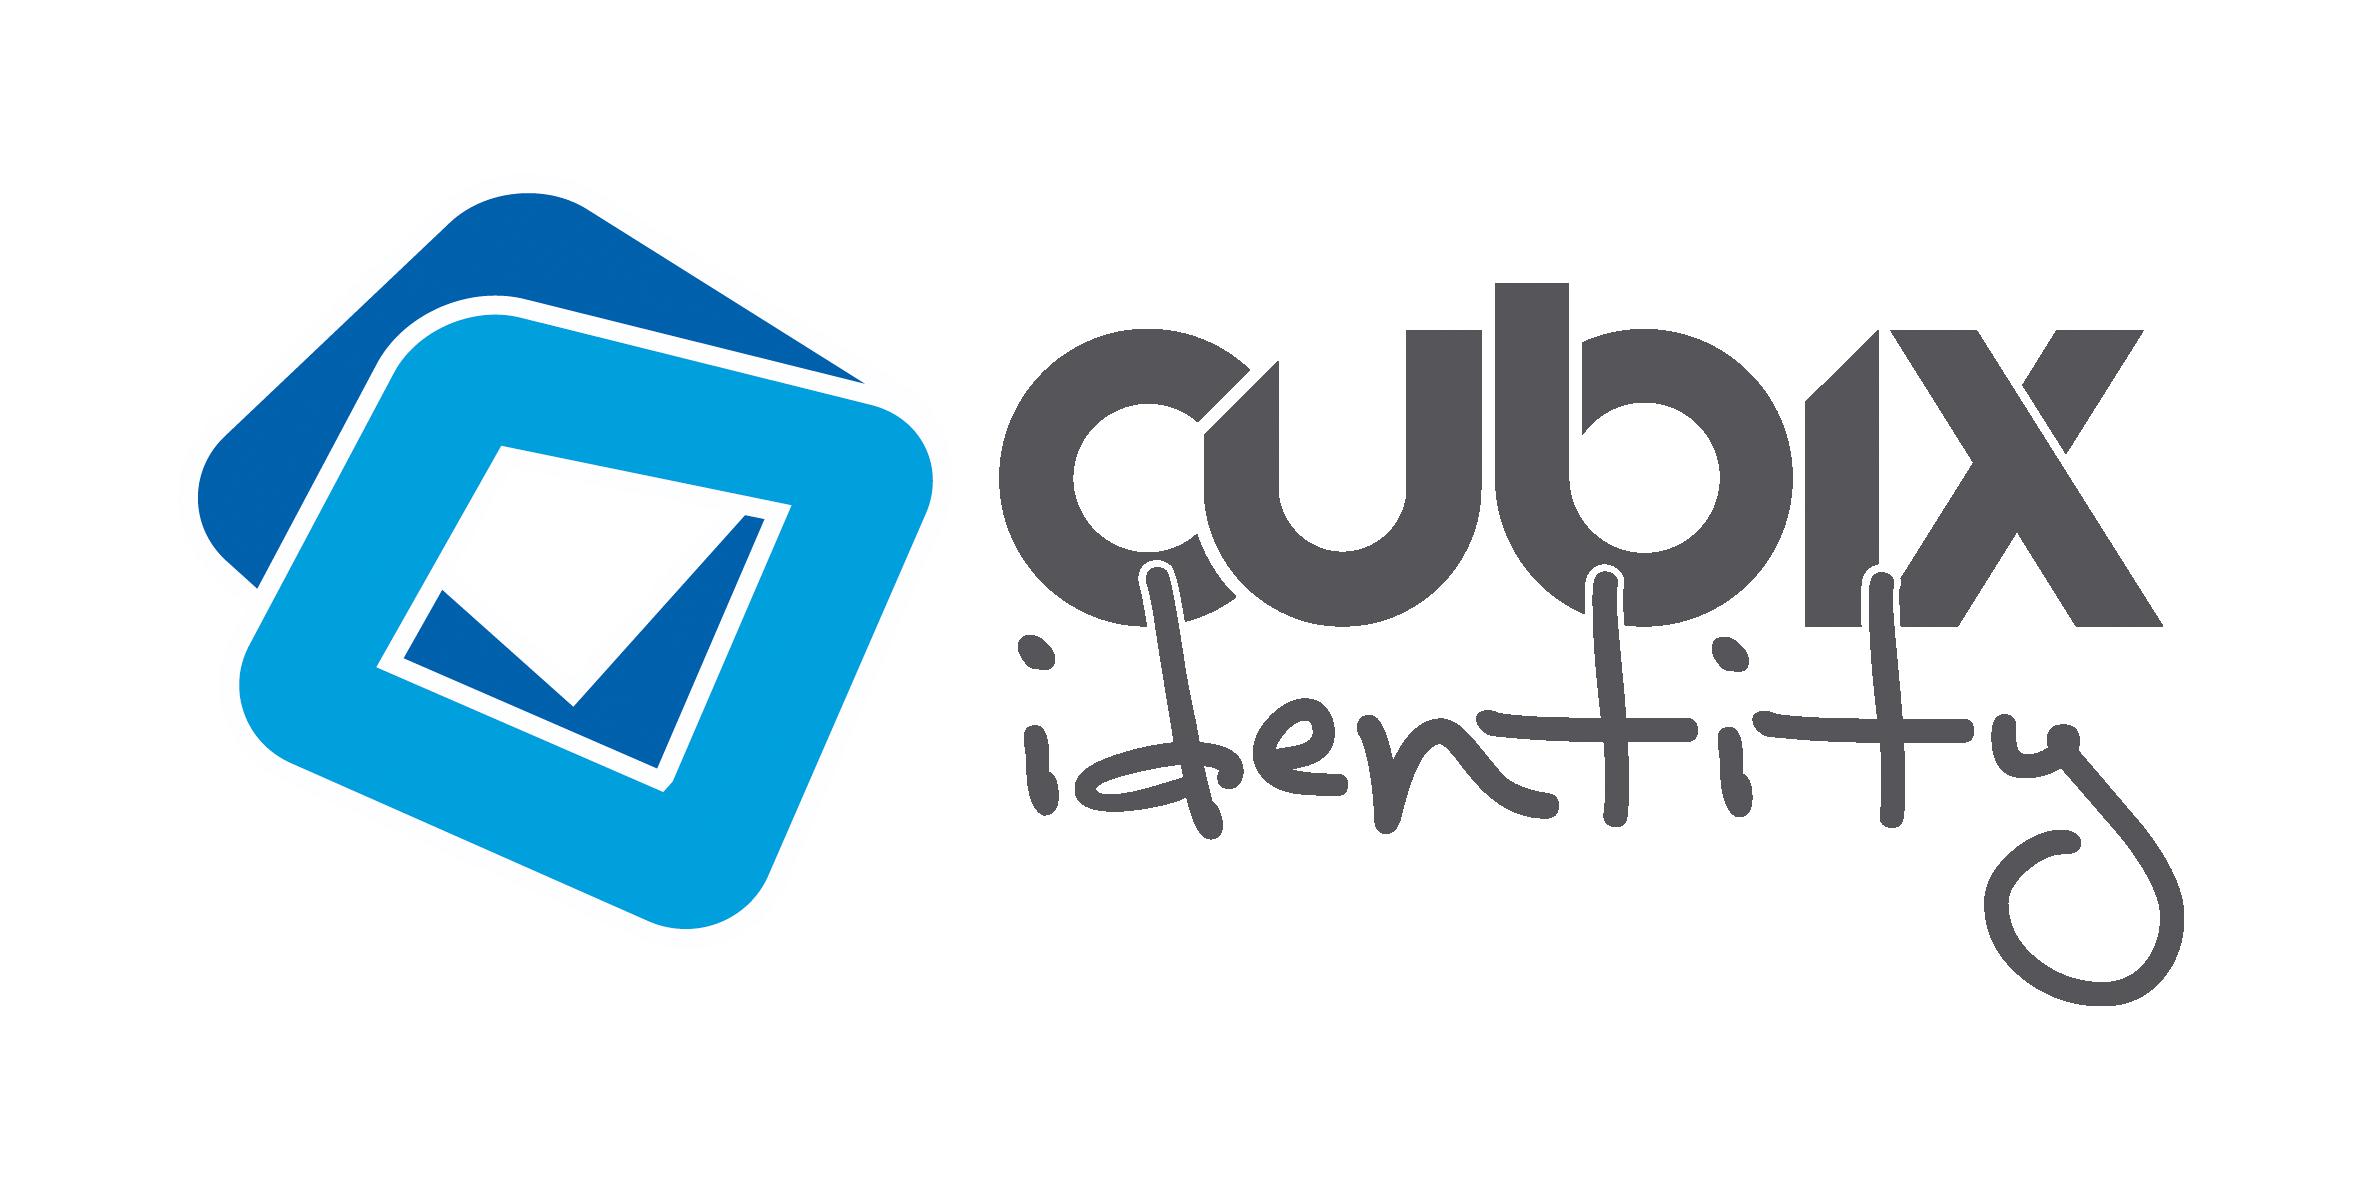 3 CUBIX identity-LOGO-RGB